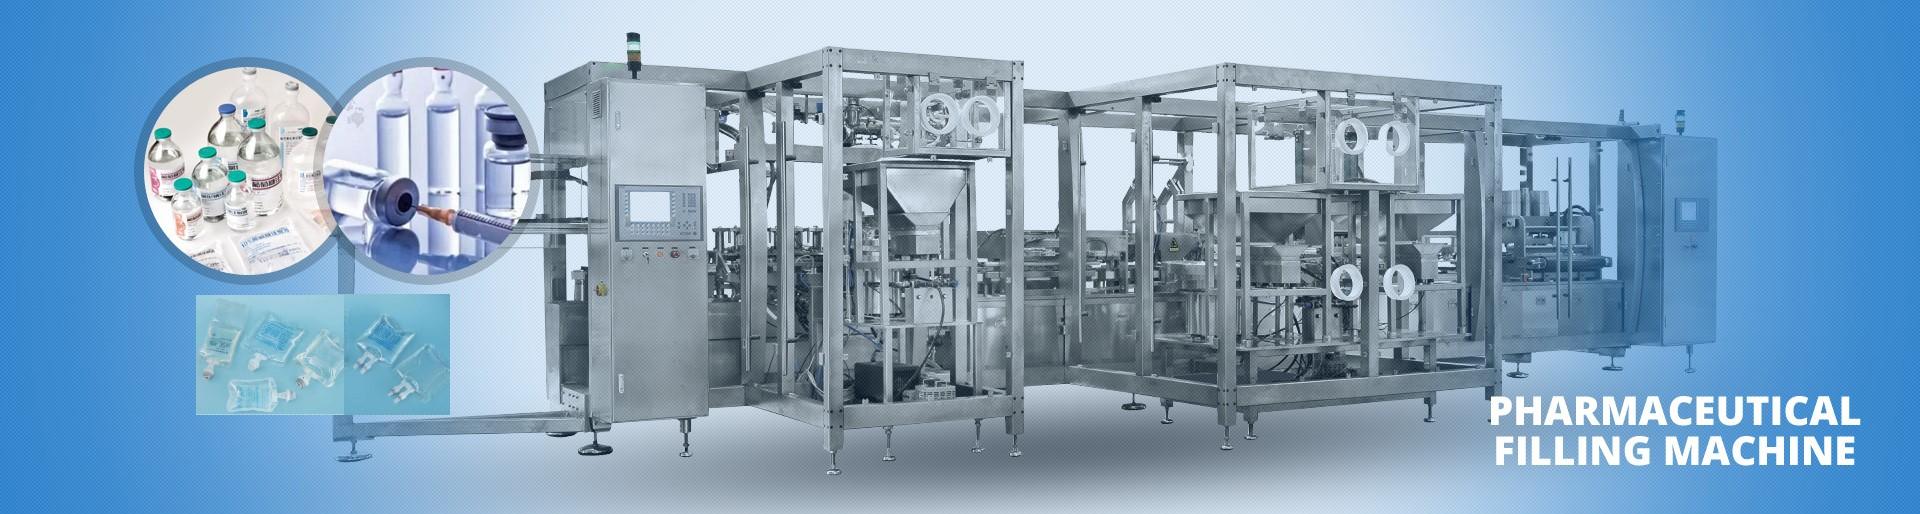 Marya pharmaceutical filling machine